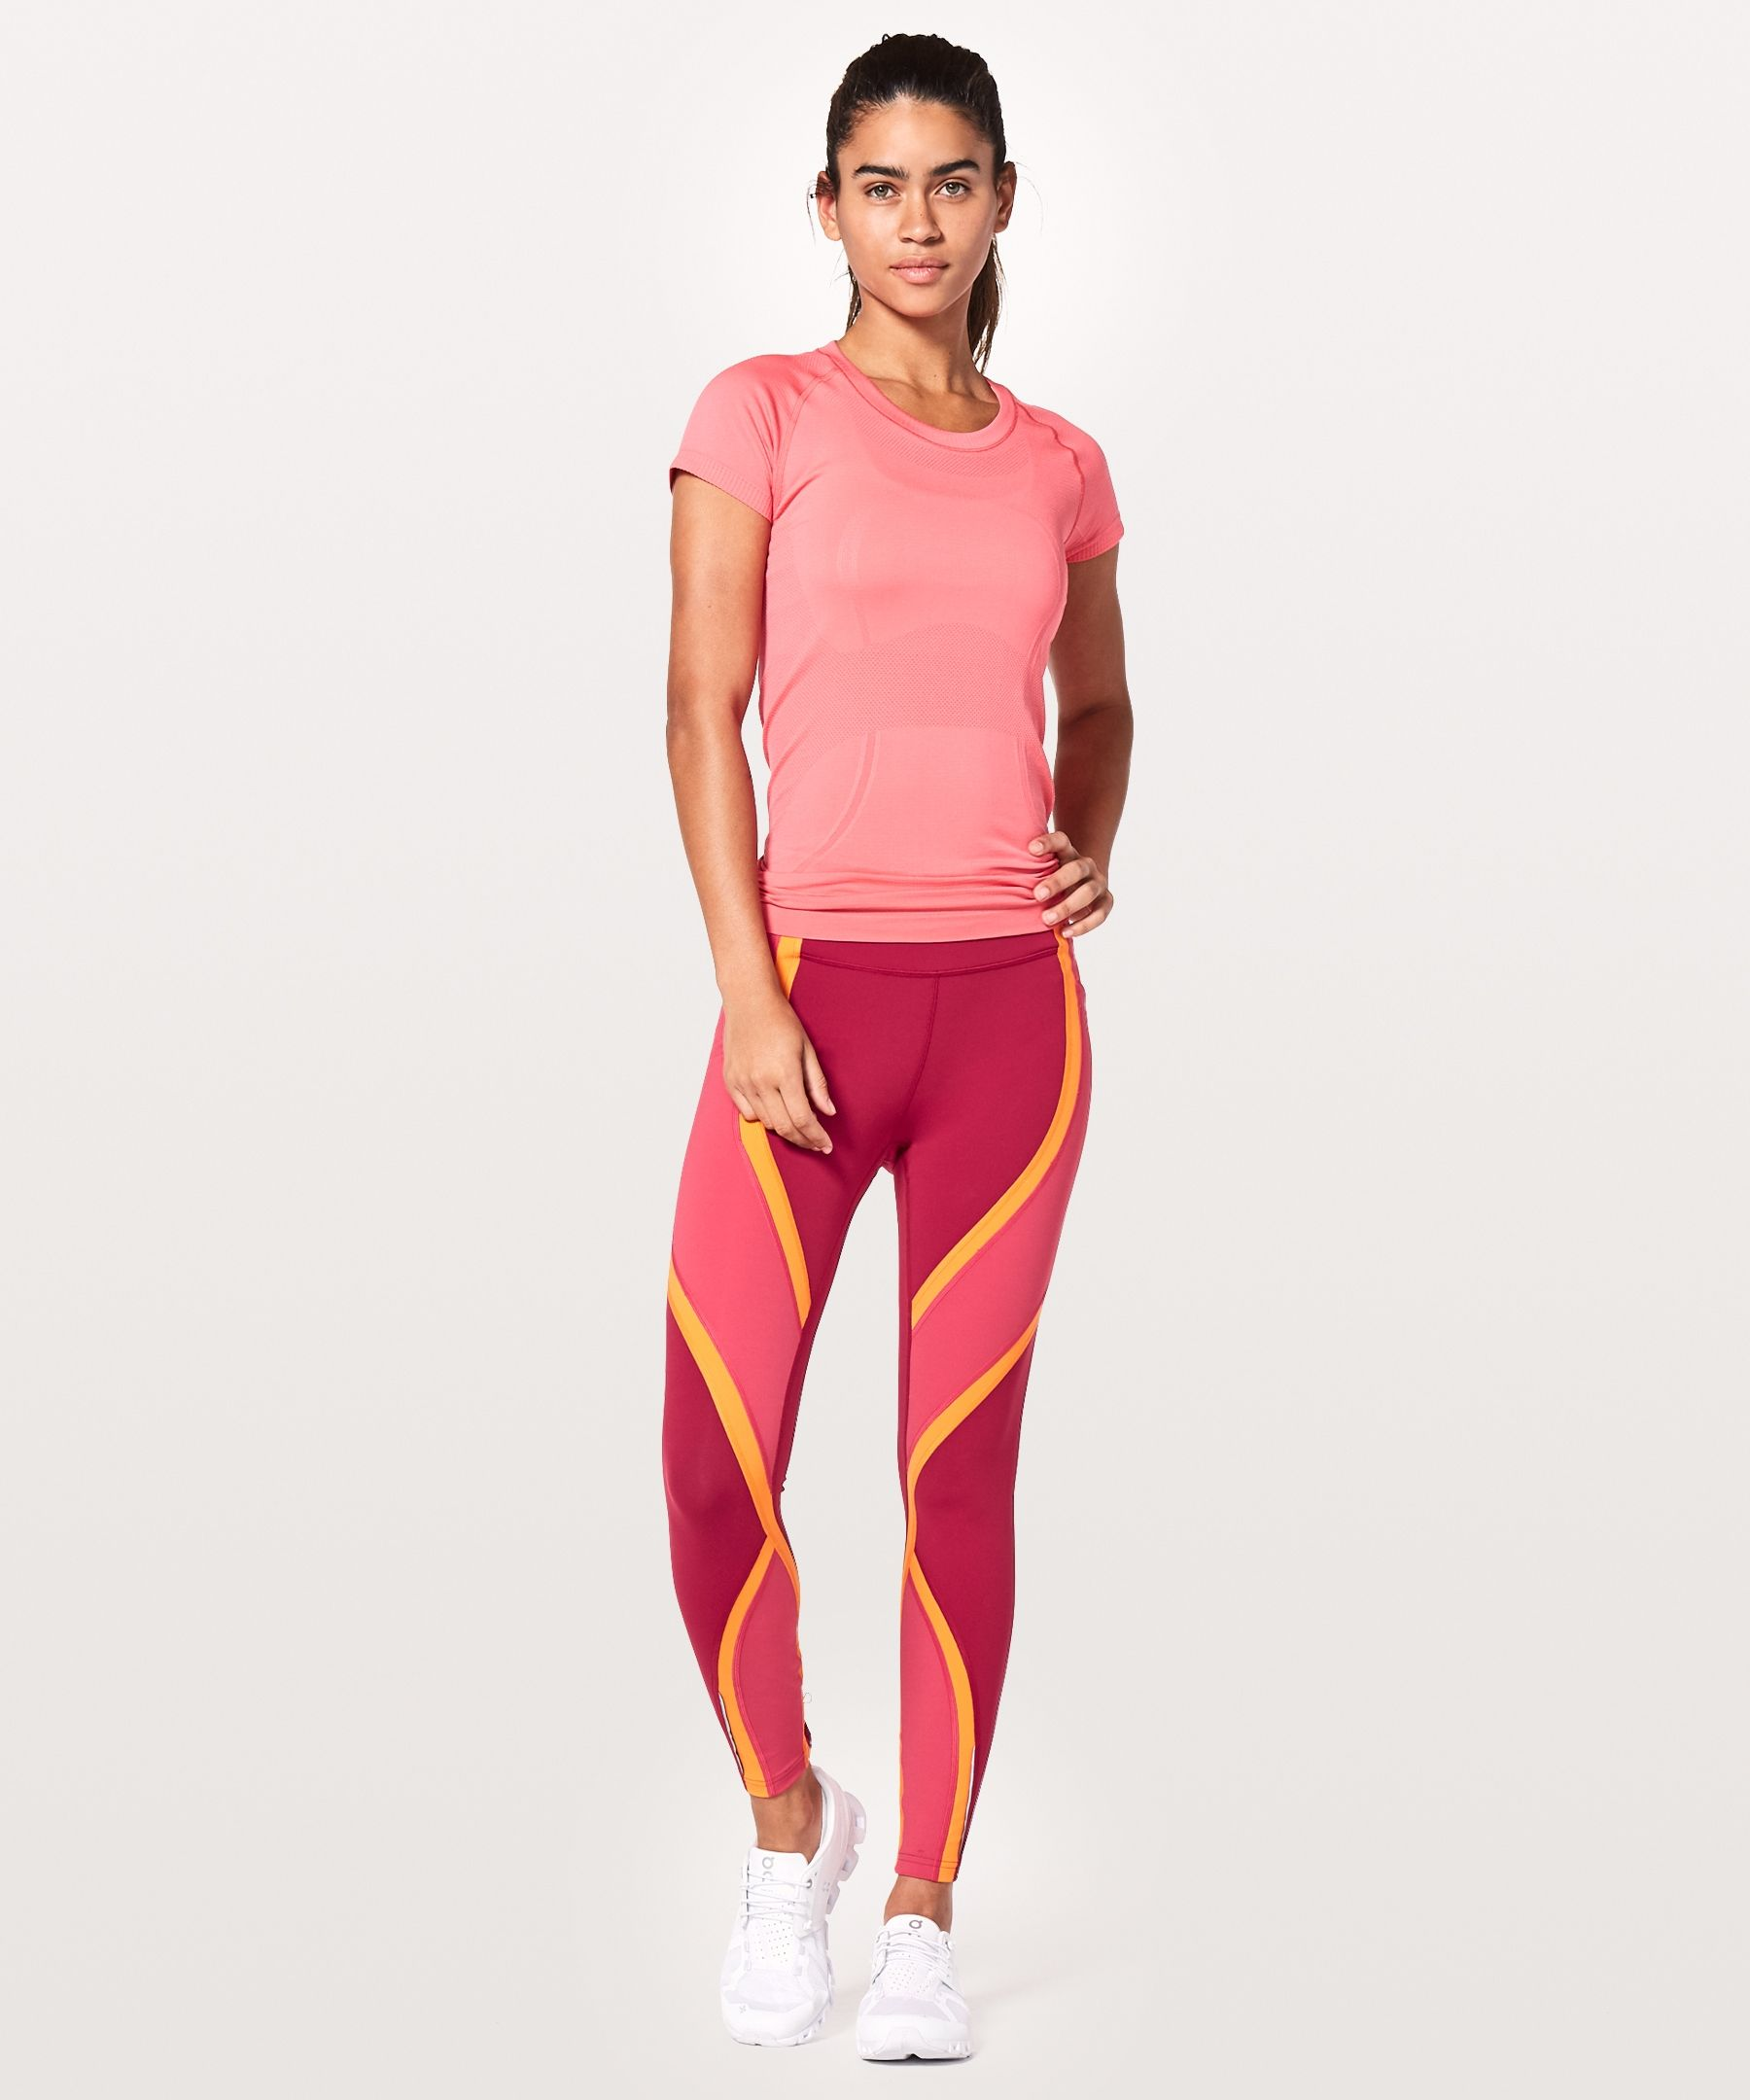 38e67e6b690be Ruby Red/Fuchsia Pink/Vivid Amber Dance Workout Clothes, Women's Pants, Yoga